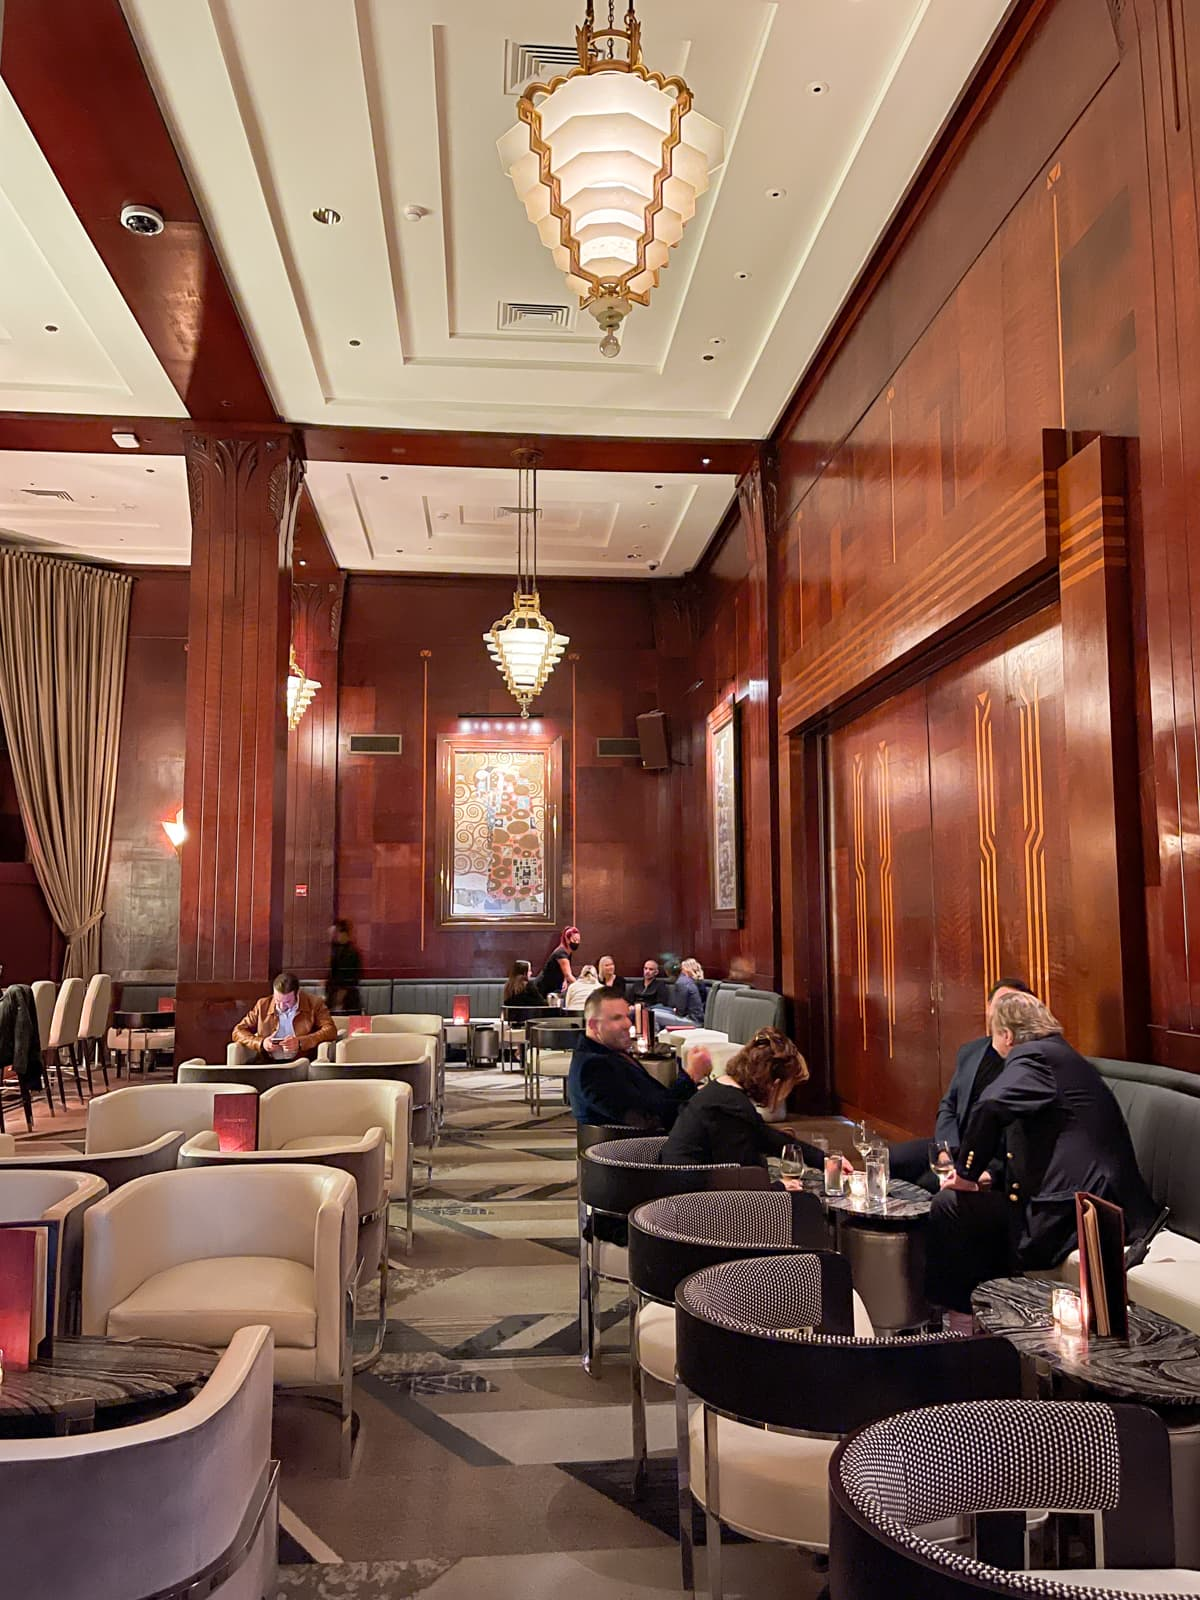 Inside the Redwood Room, a speakeasy in San Francisco